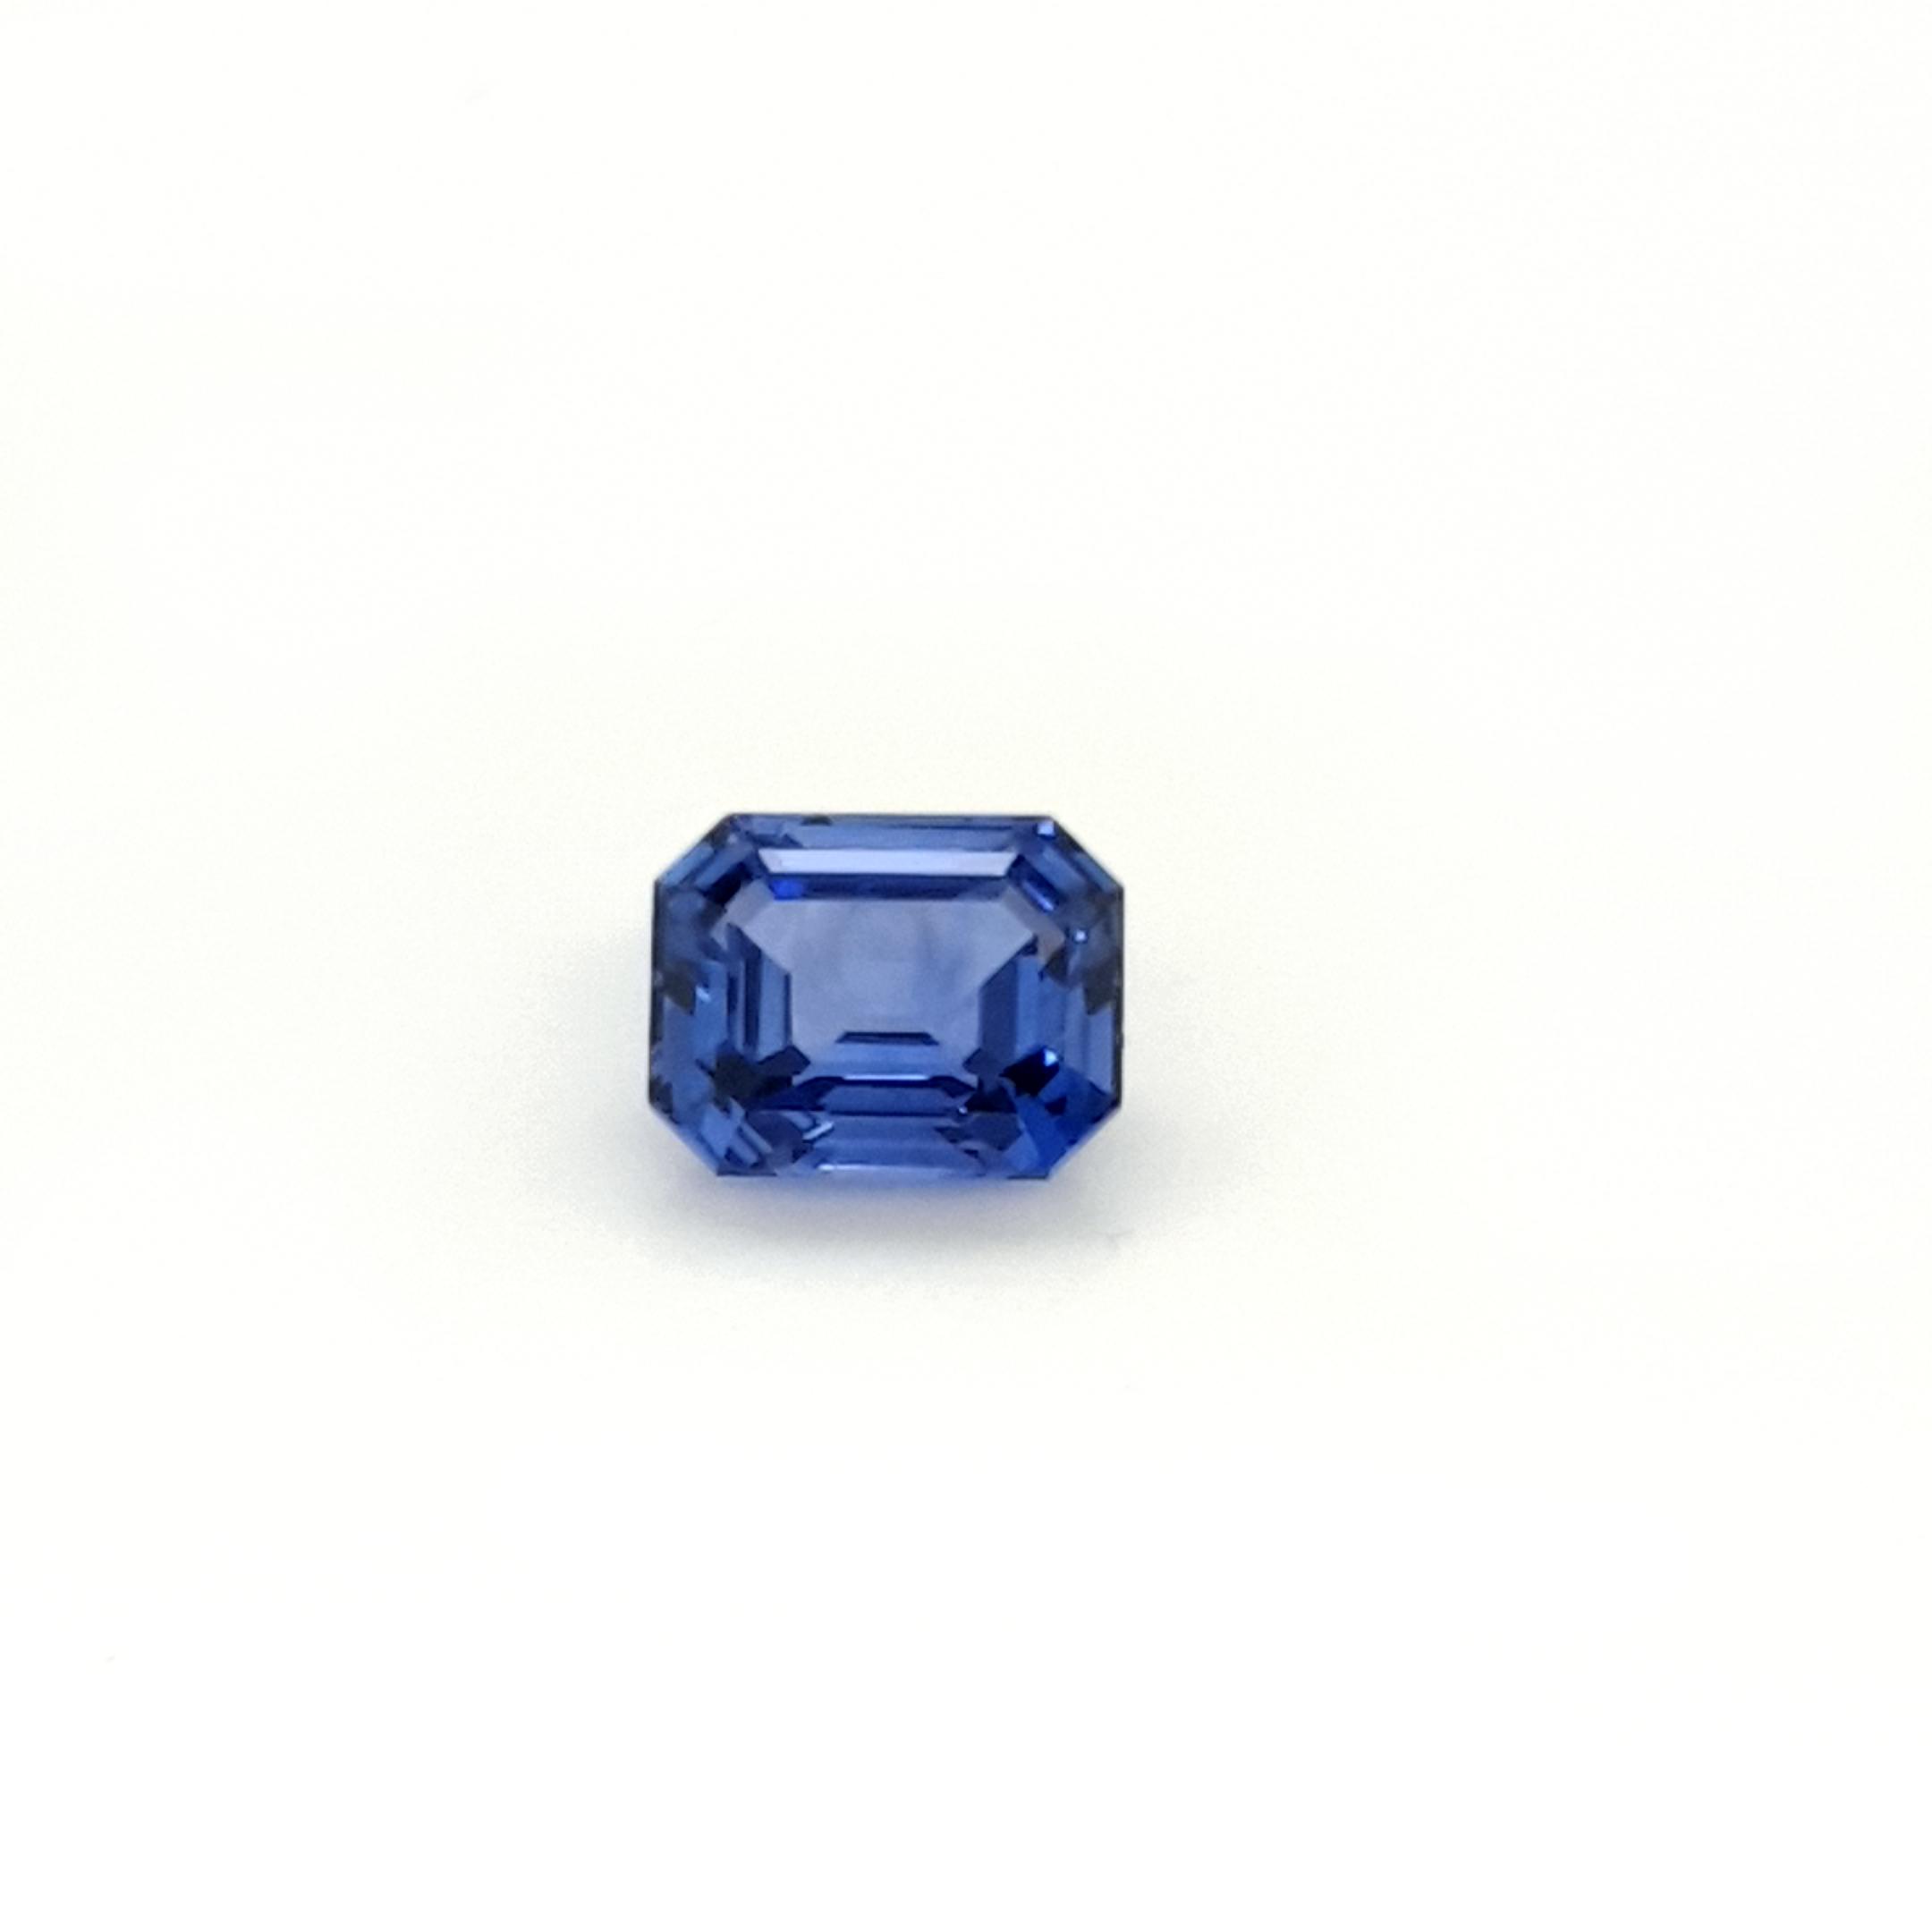 1,83ct. Sapphire Octagone 8x6 SAD19D3 ClaudiaHamann__2021-06-03-23-19-39